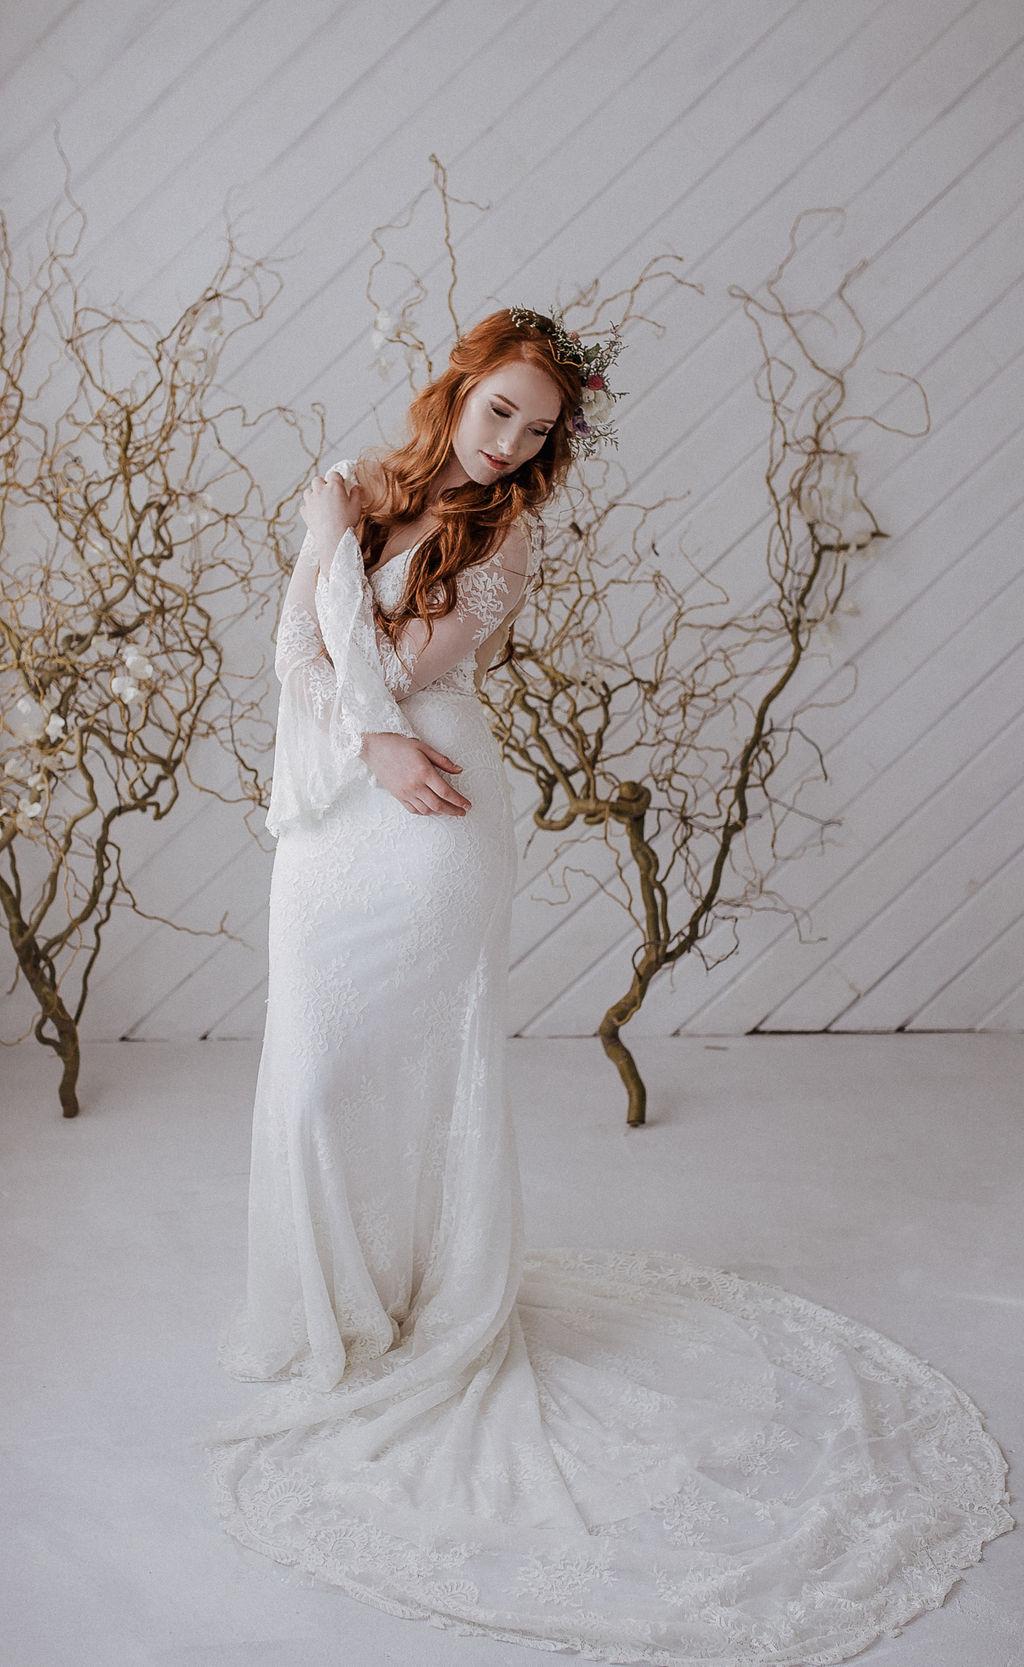 redhead beautiful spokane bride